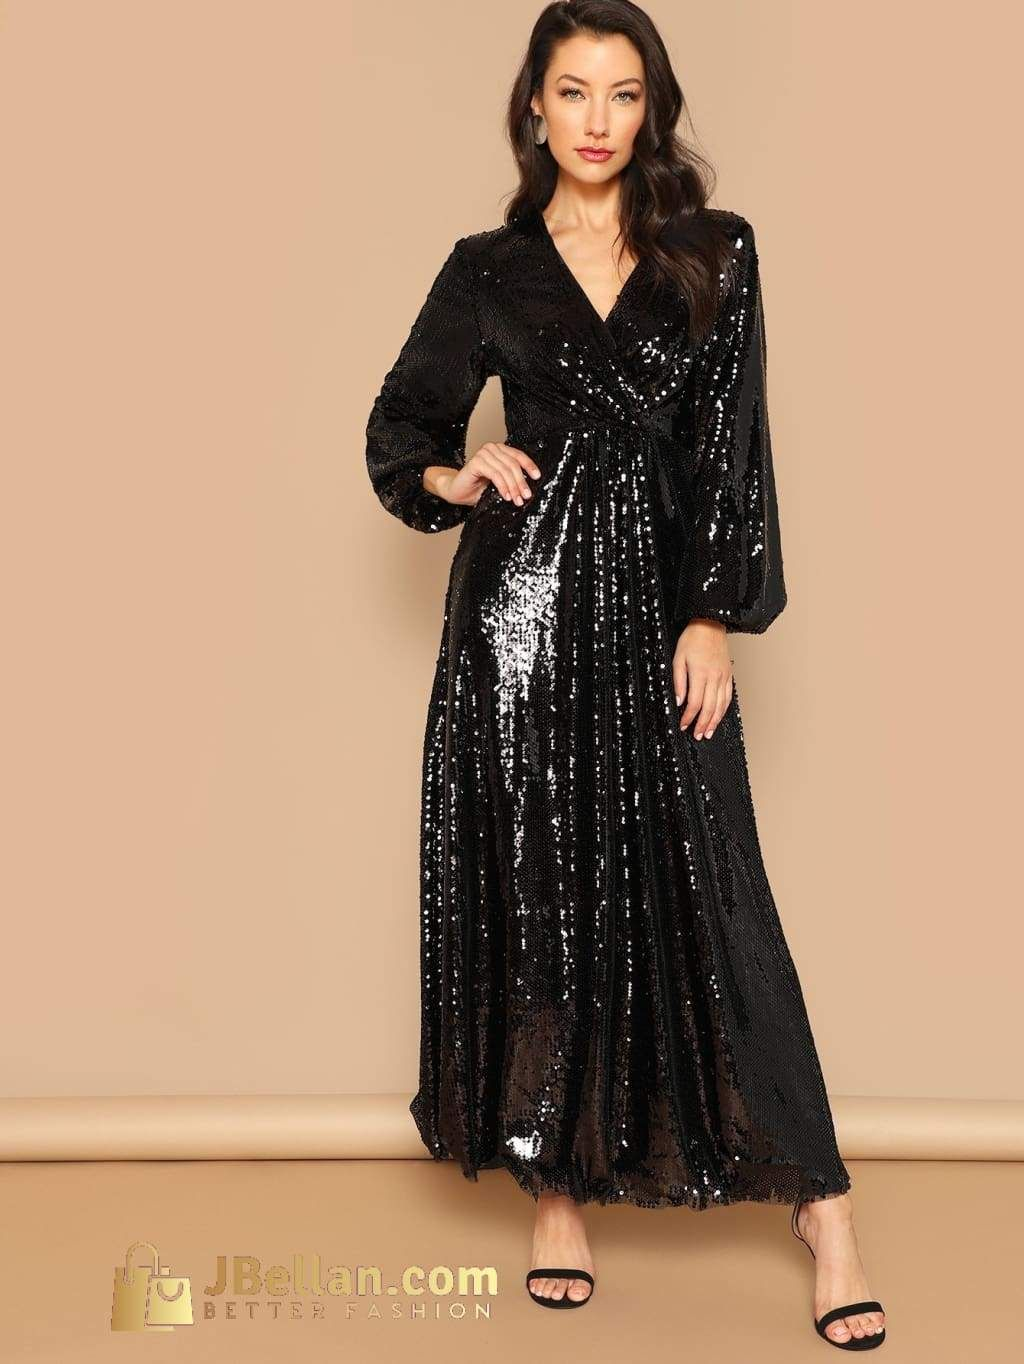 Wrap Front Lantern Sleeve Sequin Dress Maxi Dress Elegant Maxi Dress Sequin Maxi Dress [ 1364 x 1024 Pixel ]